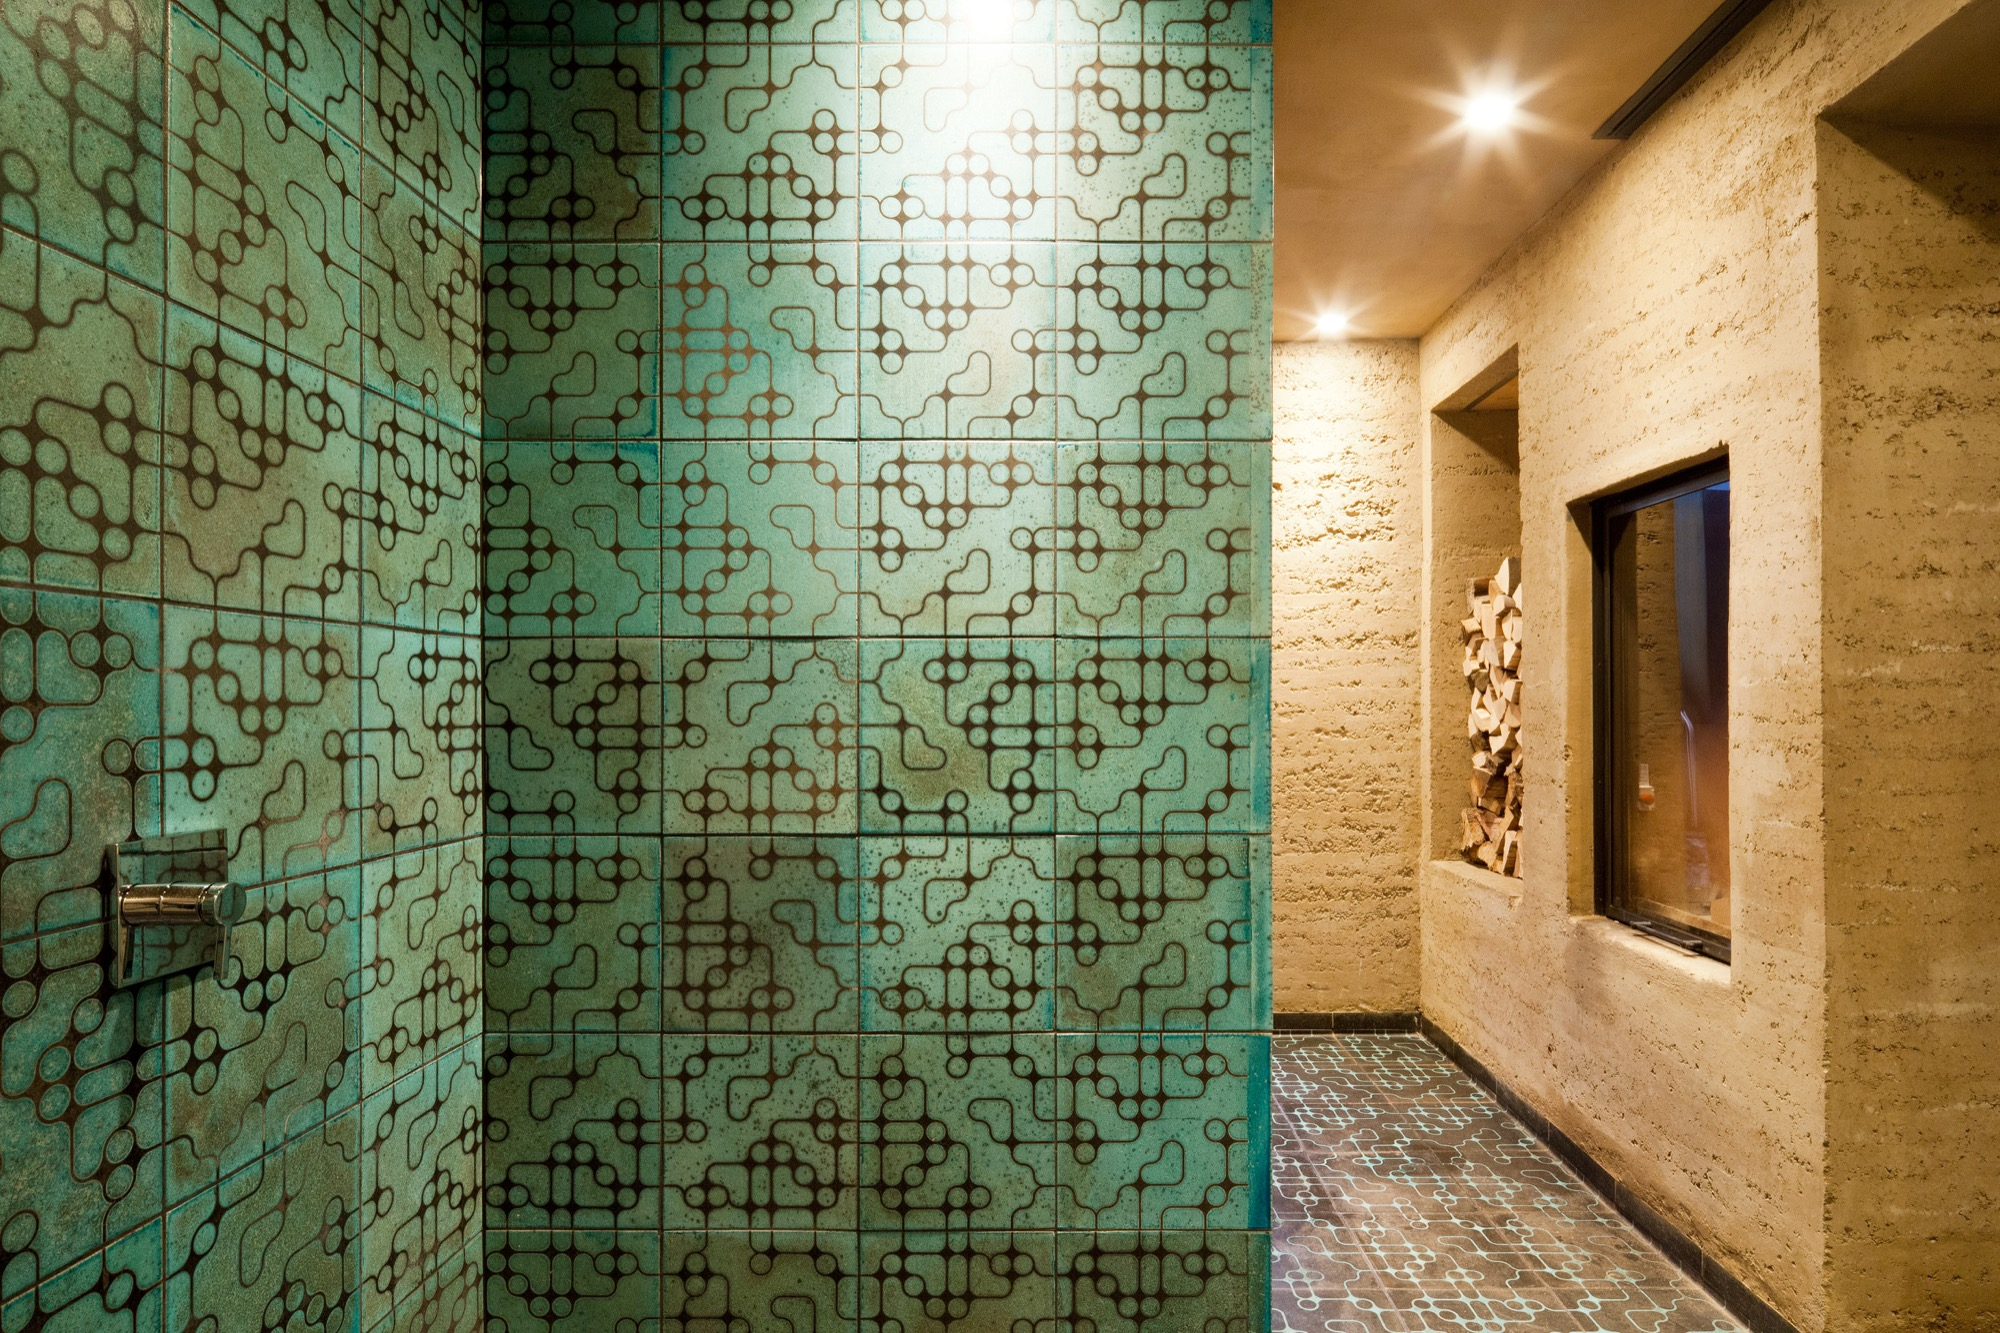 A wall of Karak tiles